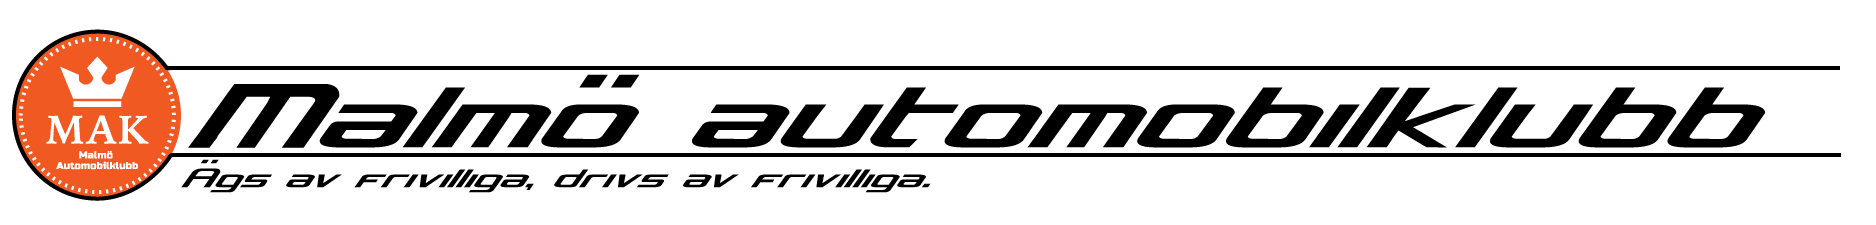 Malmö Automobilklubb